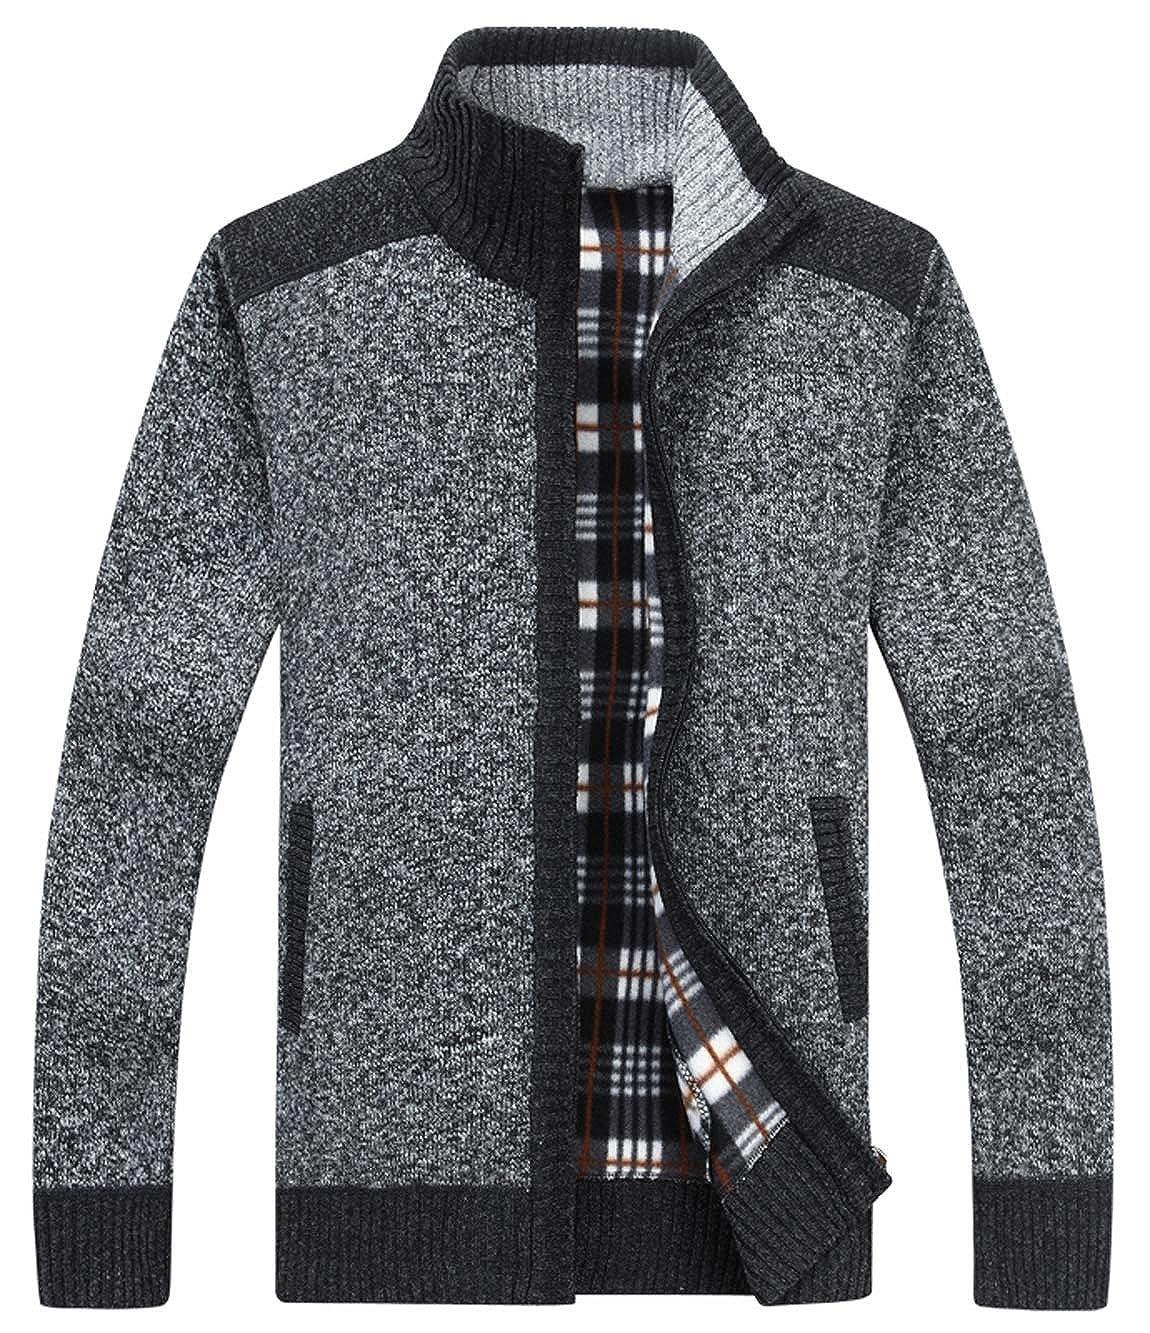 HOWON Men's Fashion Zipper Cardigan Sweaters